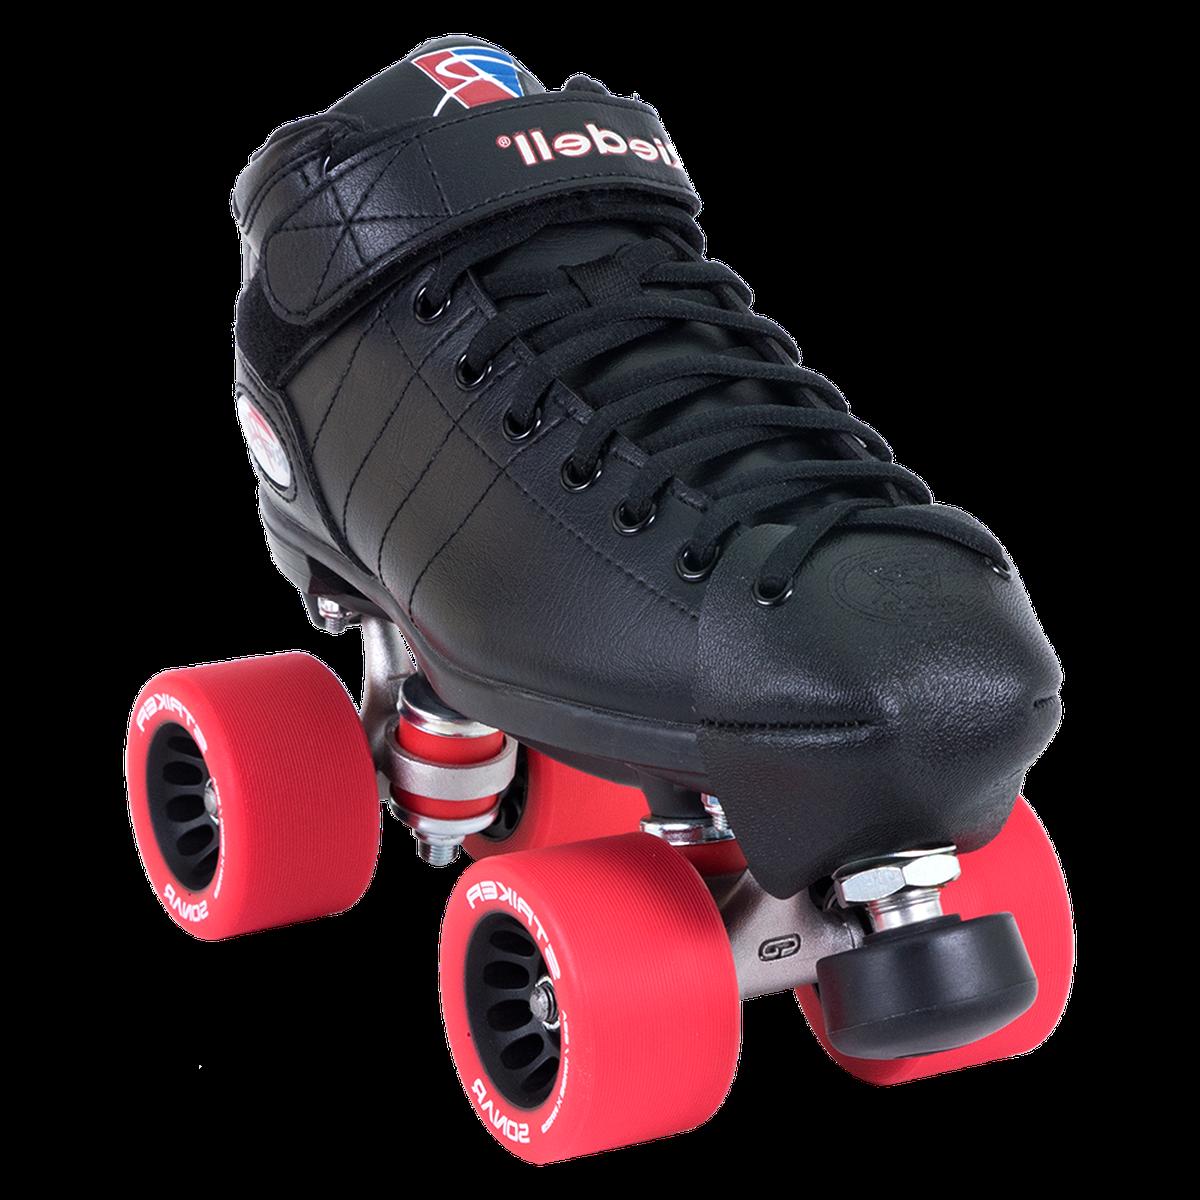 riedell roller derby skates for sale